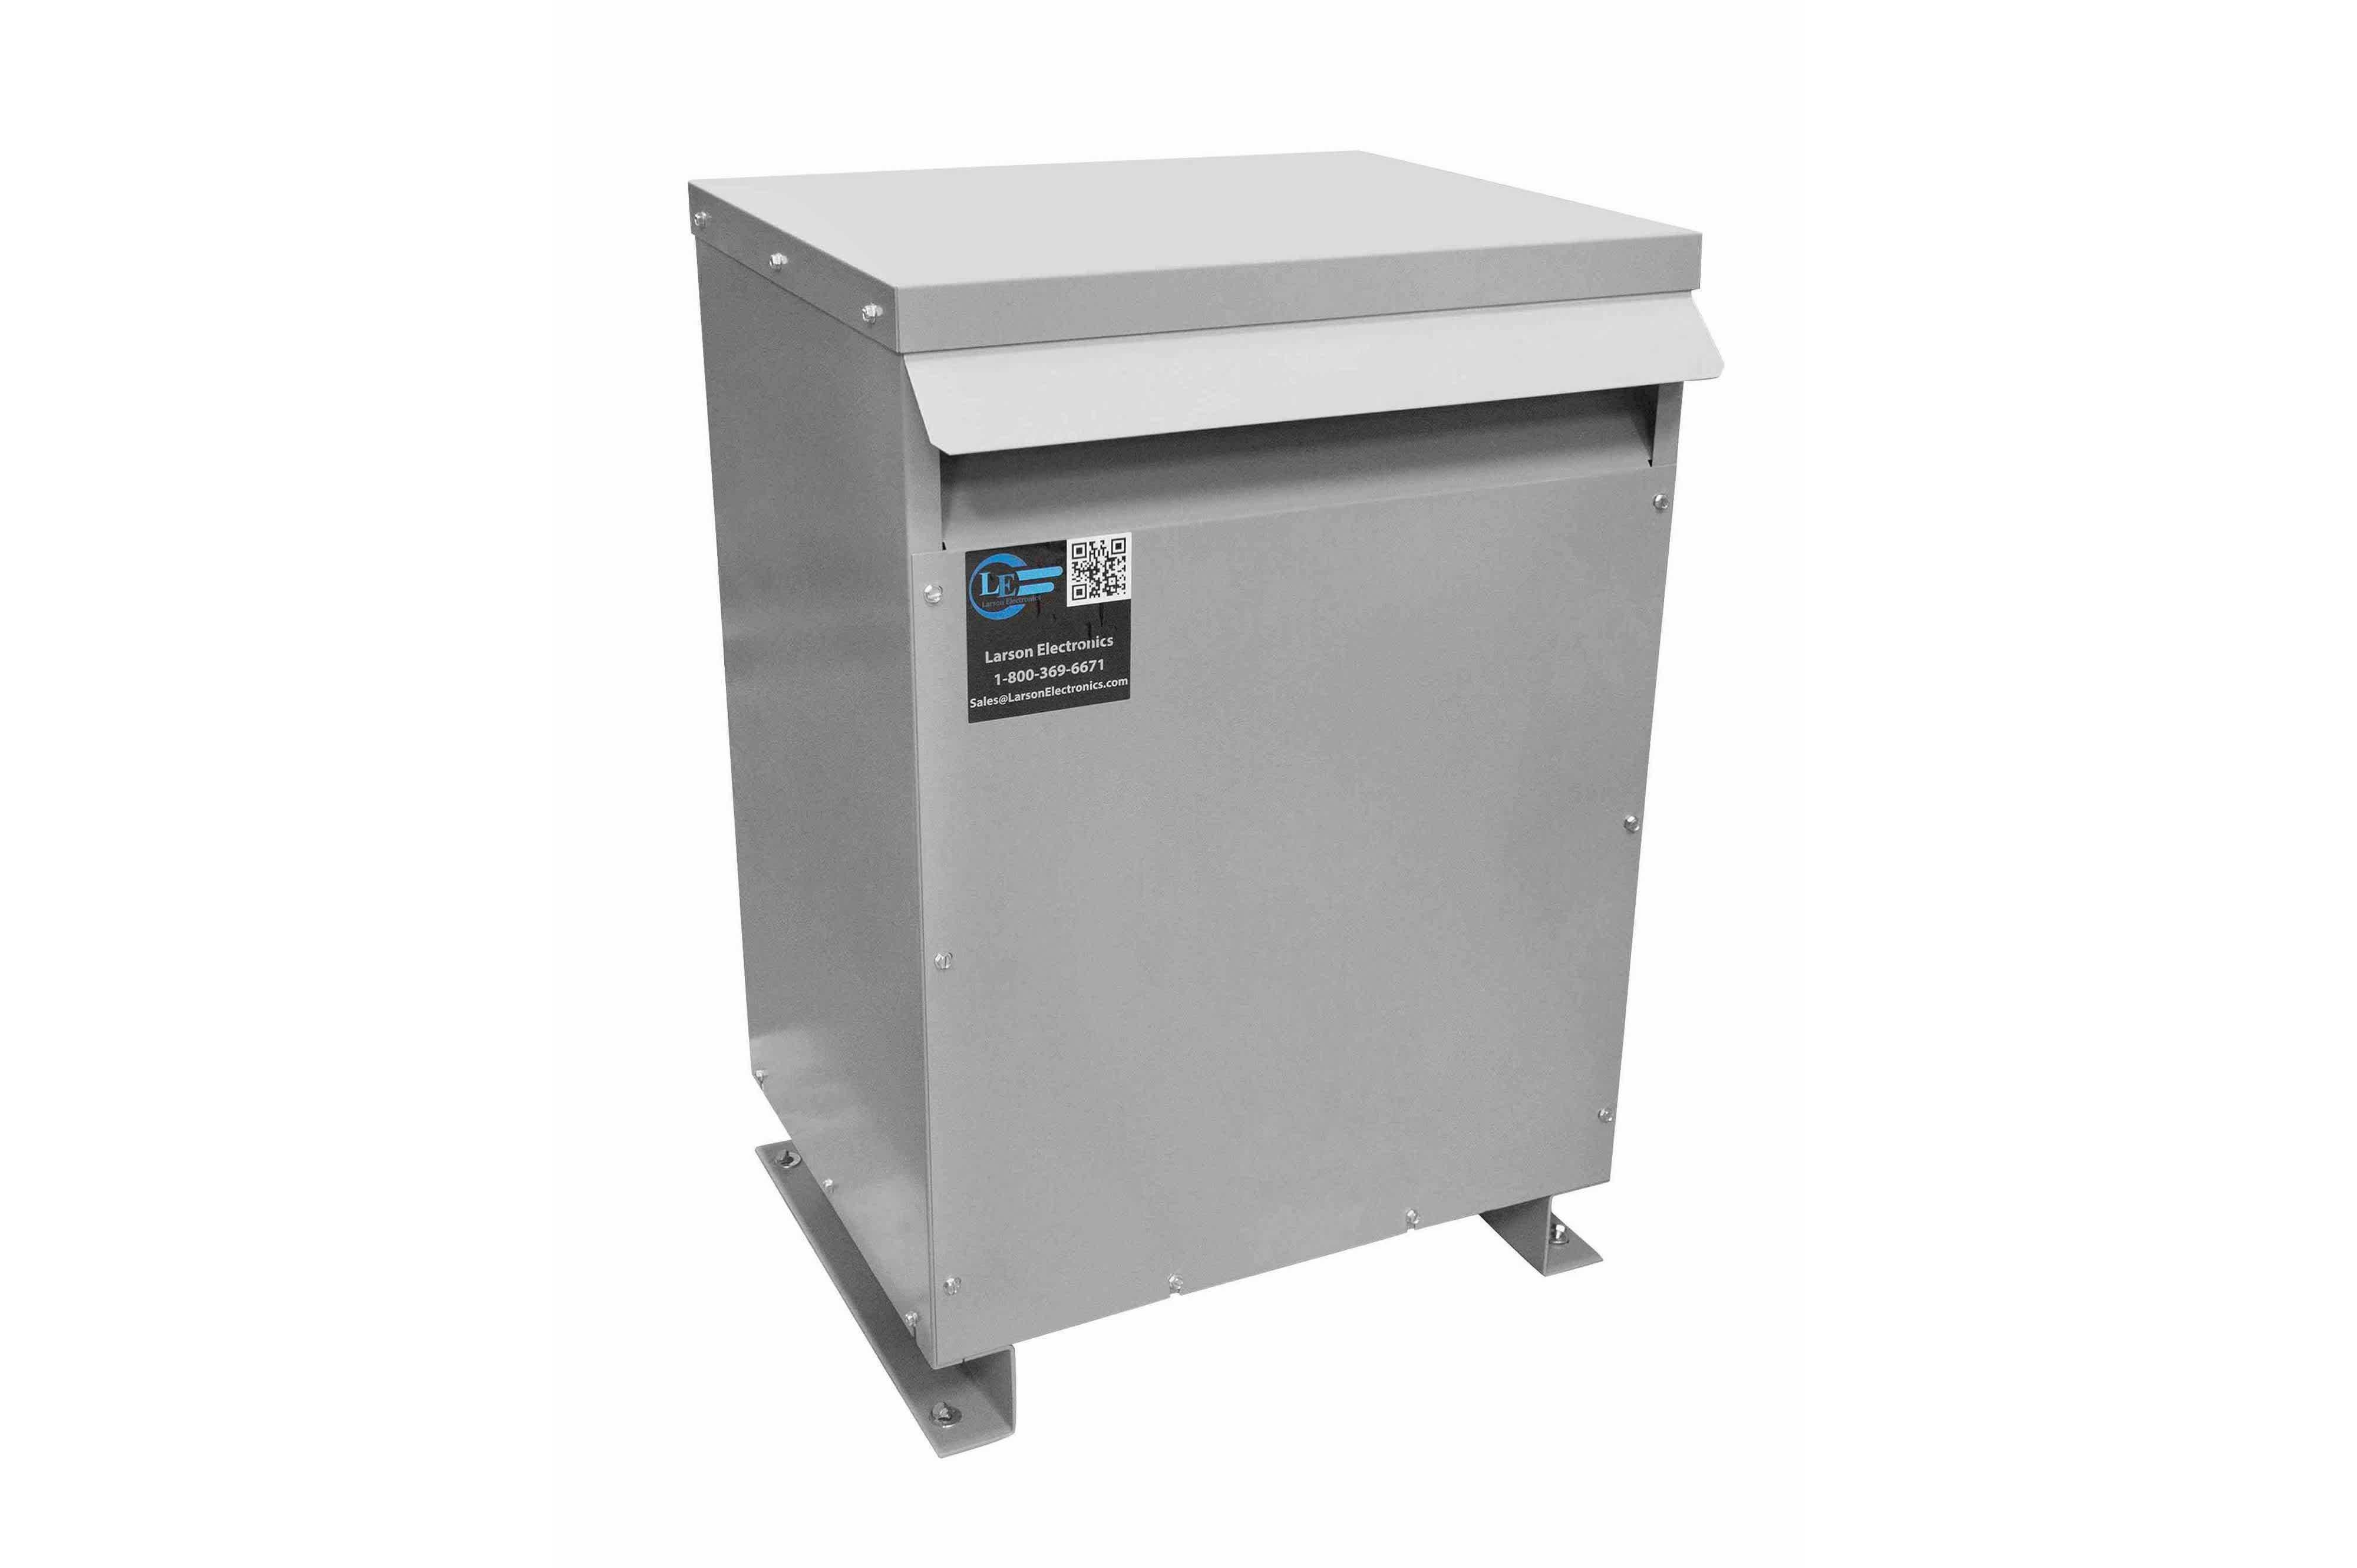 112.5 kVA 3PH Isolation Transformer, 380V Wye Primary, 240V/120 Delta Secondary, N3R, Ventilated, 60 Hz